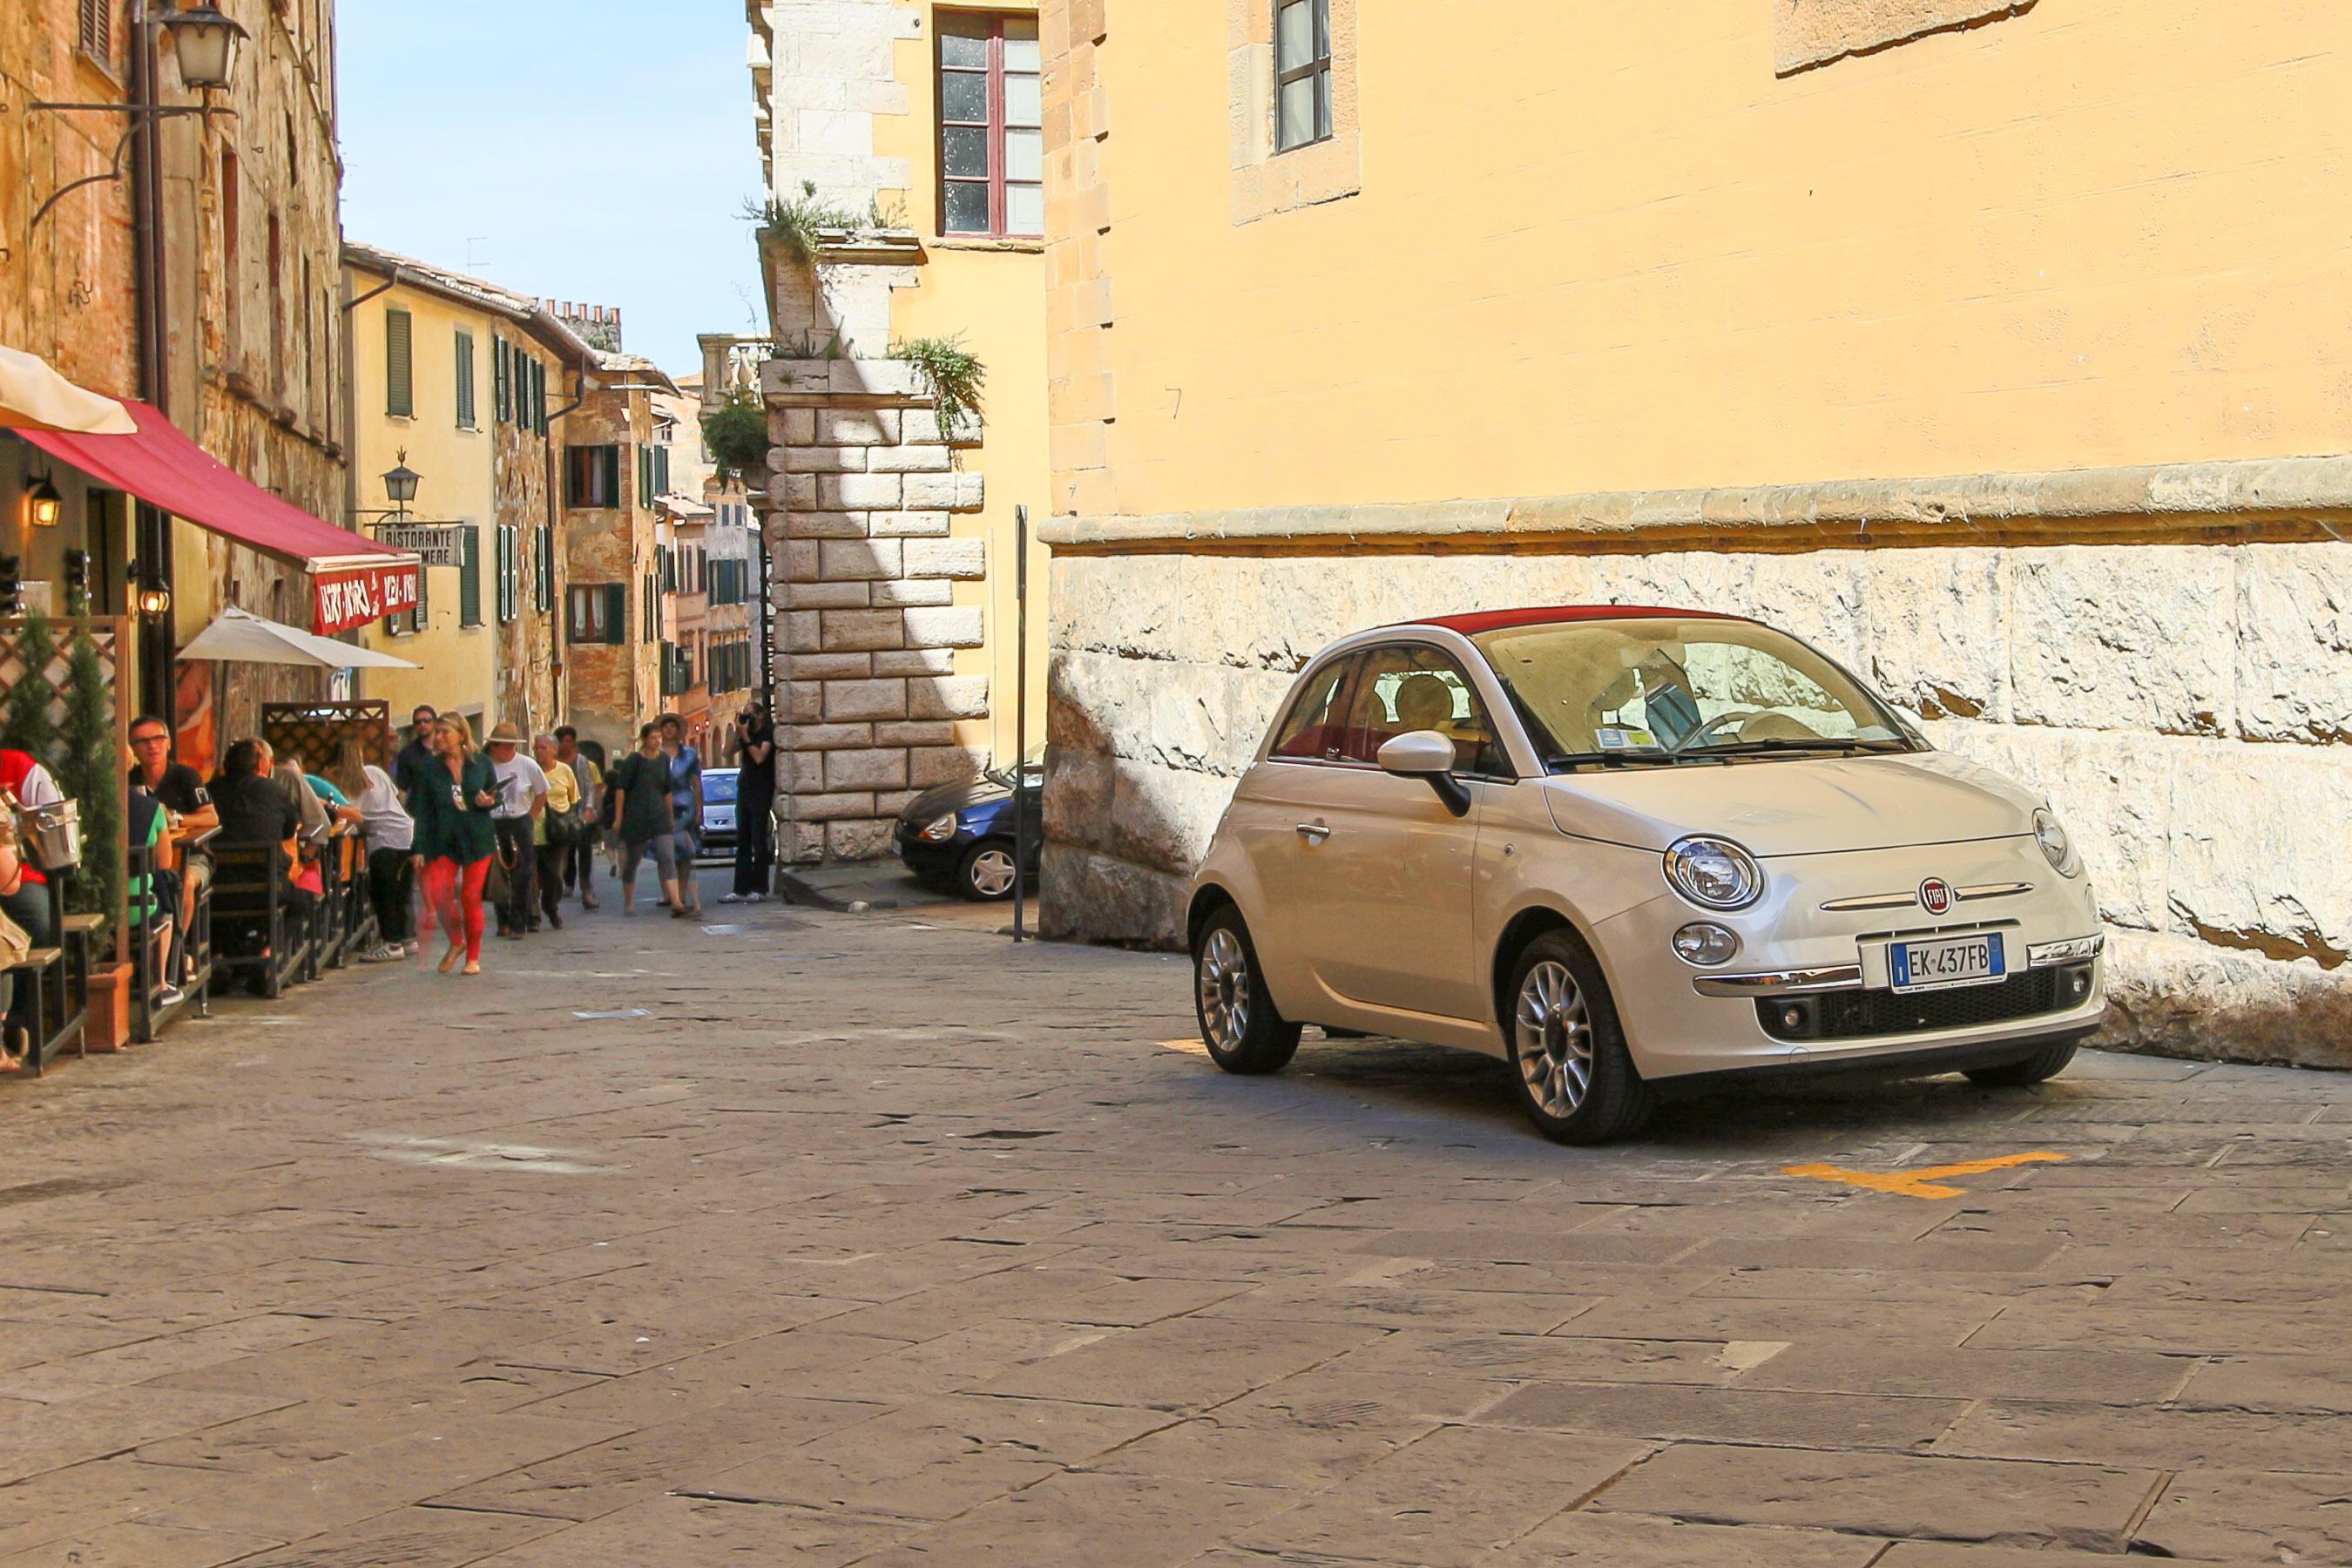 Culture, Equipment, Montepulciano, Travel, Vehicles